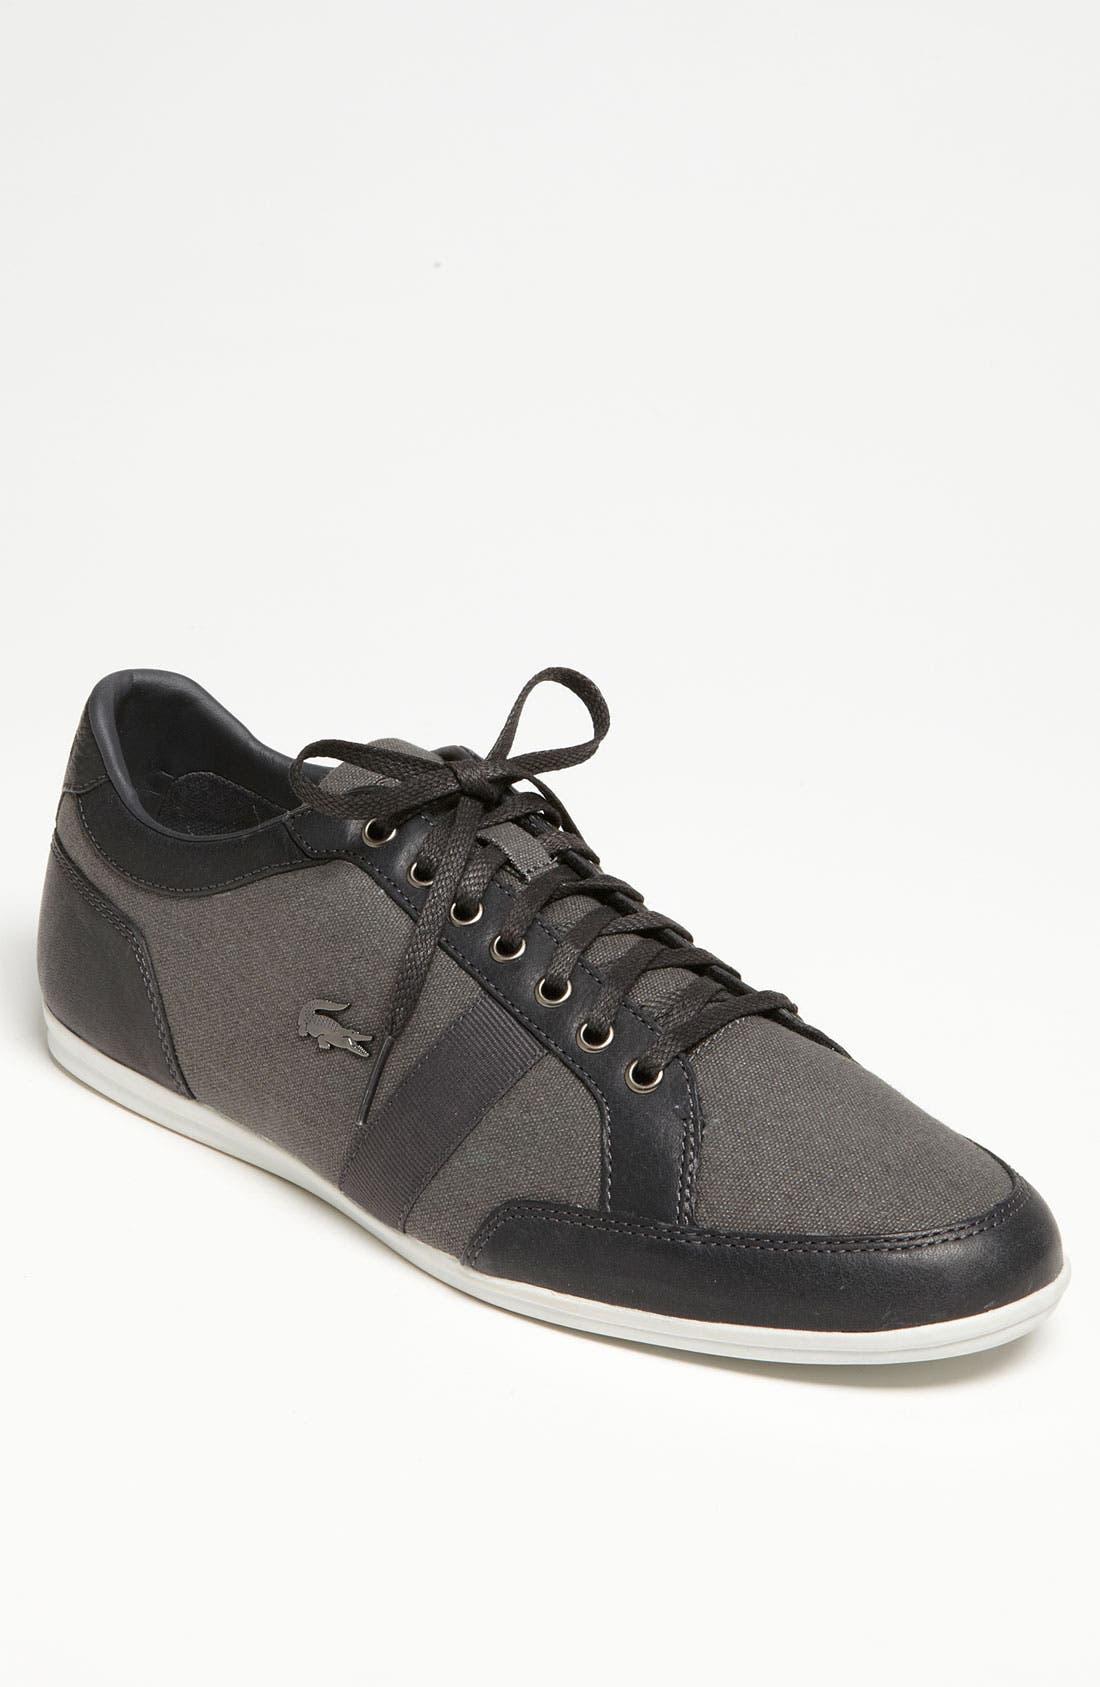 Alternate Image 1 Selected - Lacoste 'Alisos 5' Sneaker